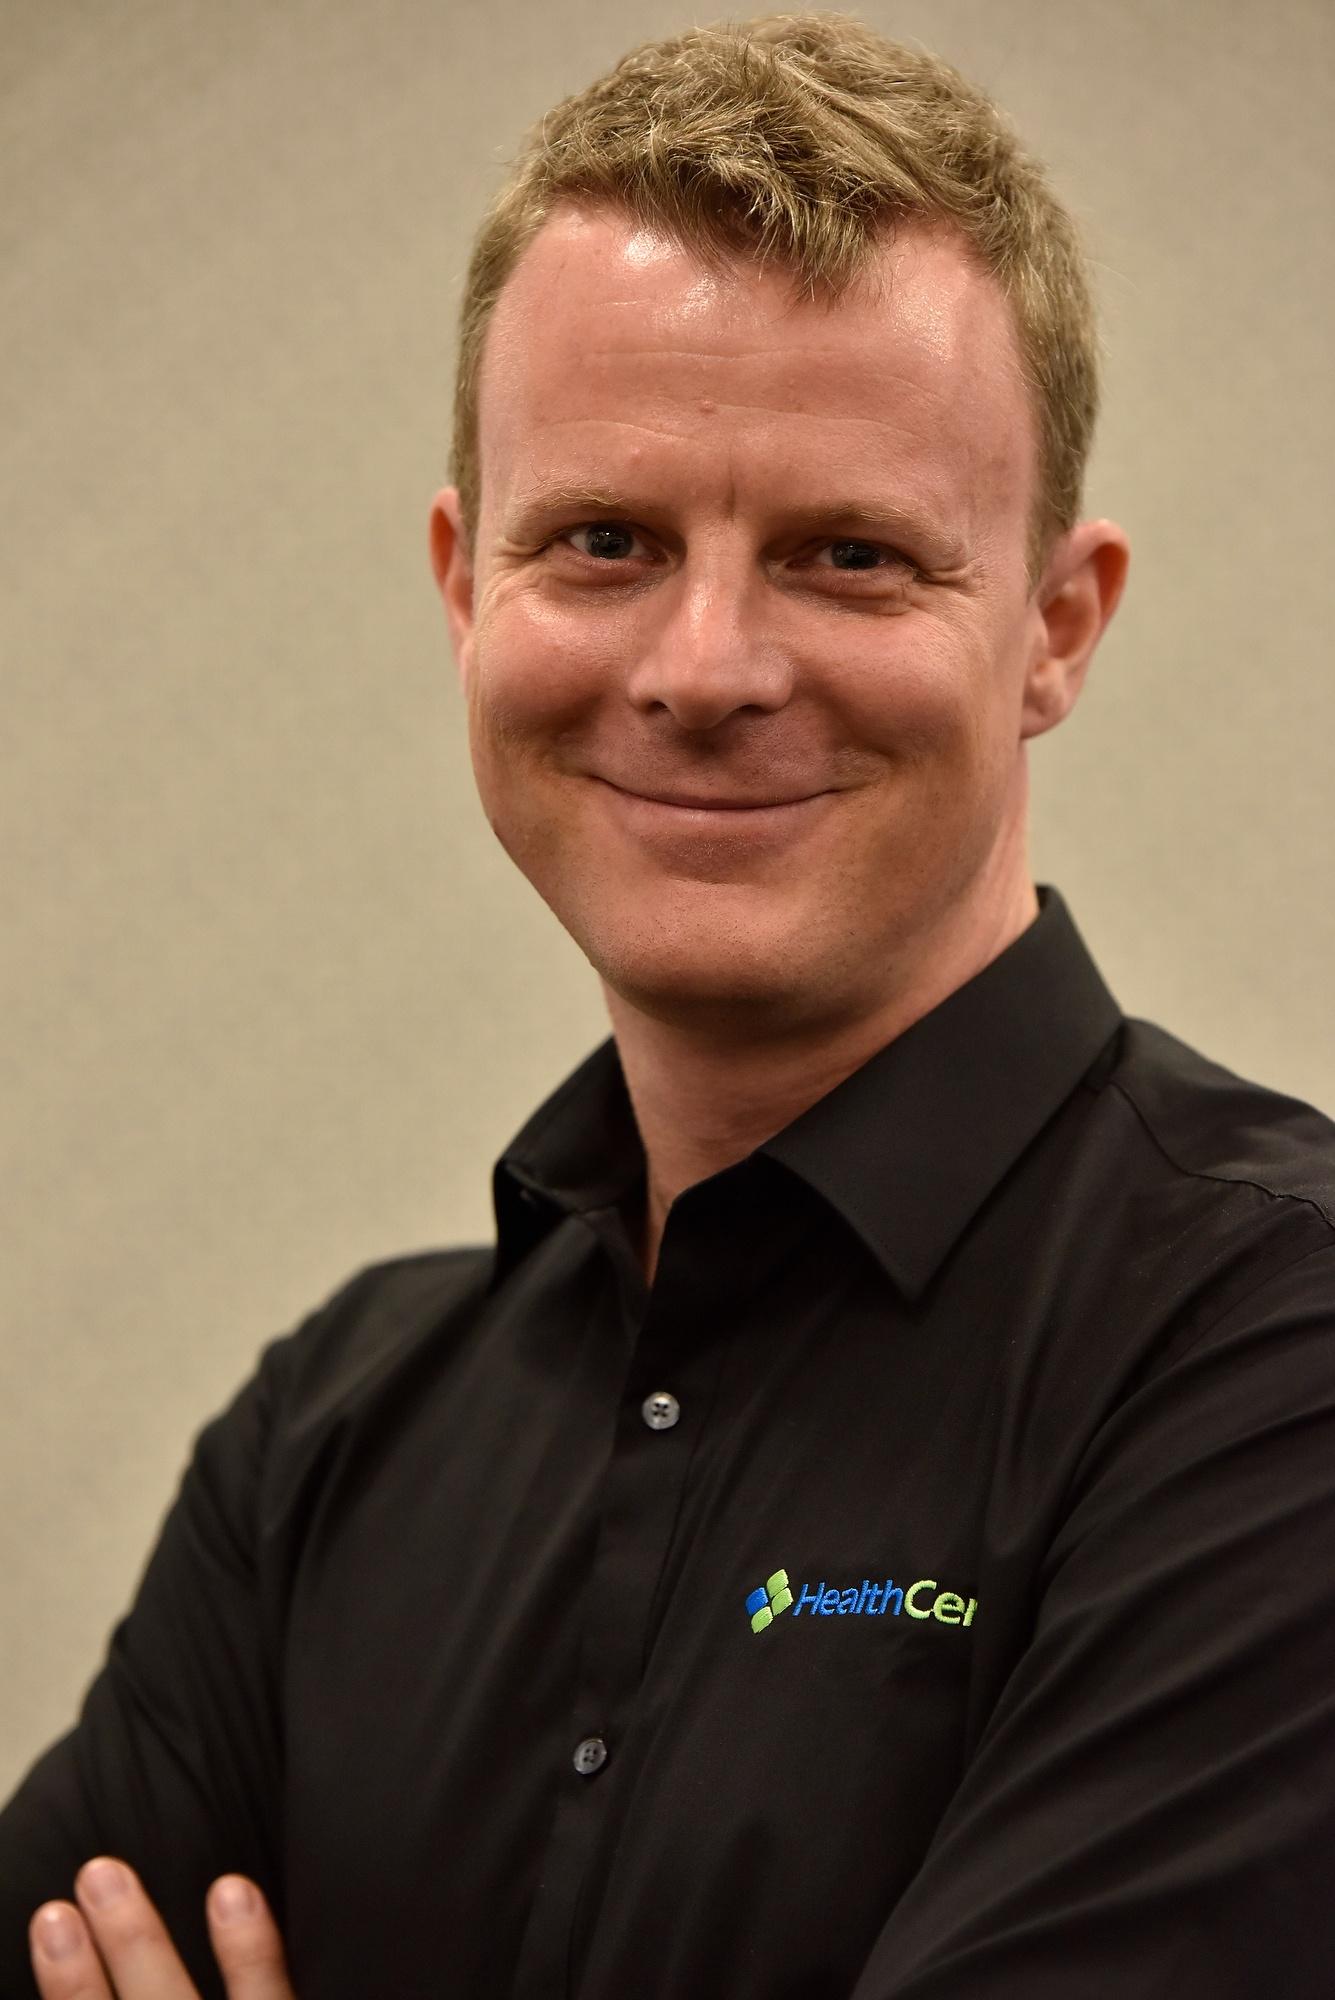 Hamish_Elton_Chief_Operating_Manager.jpg